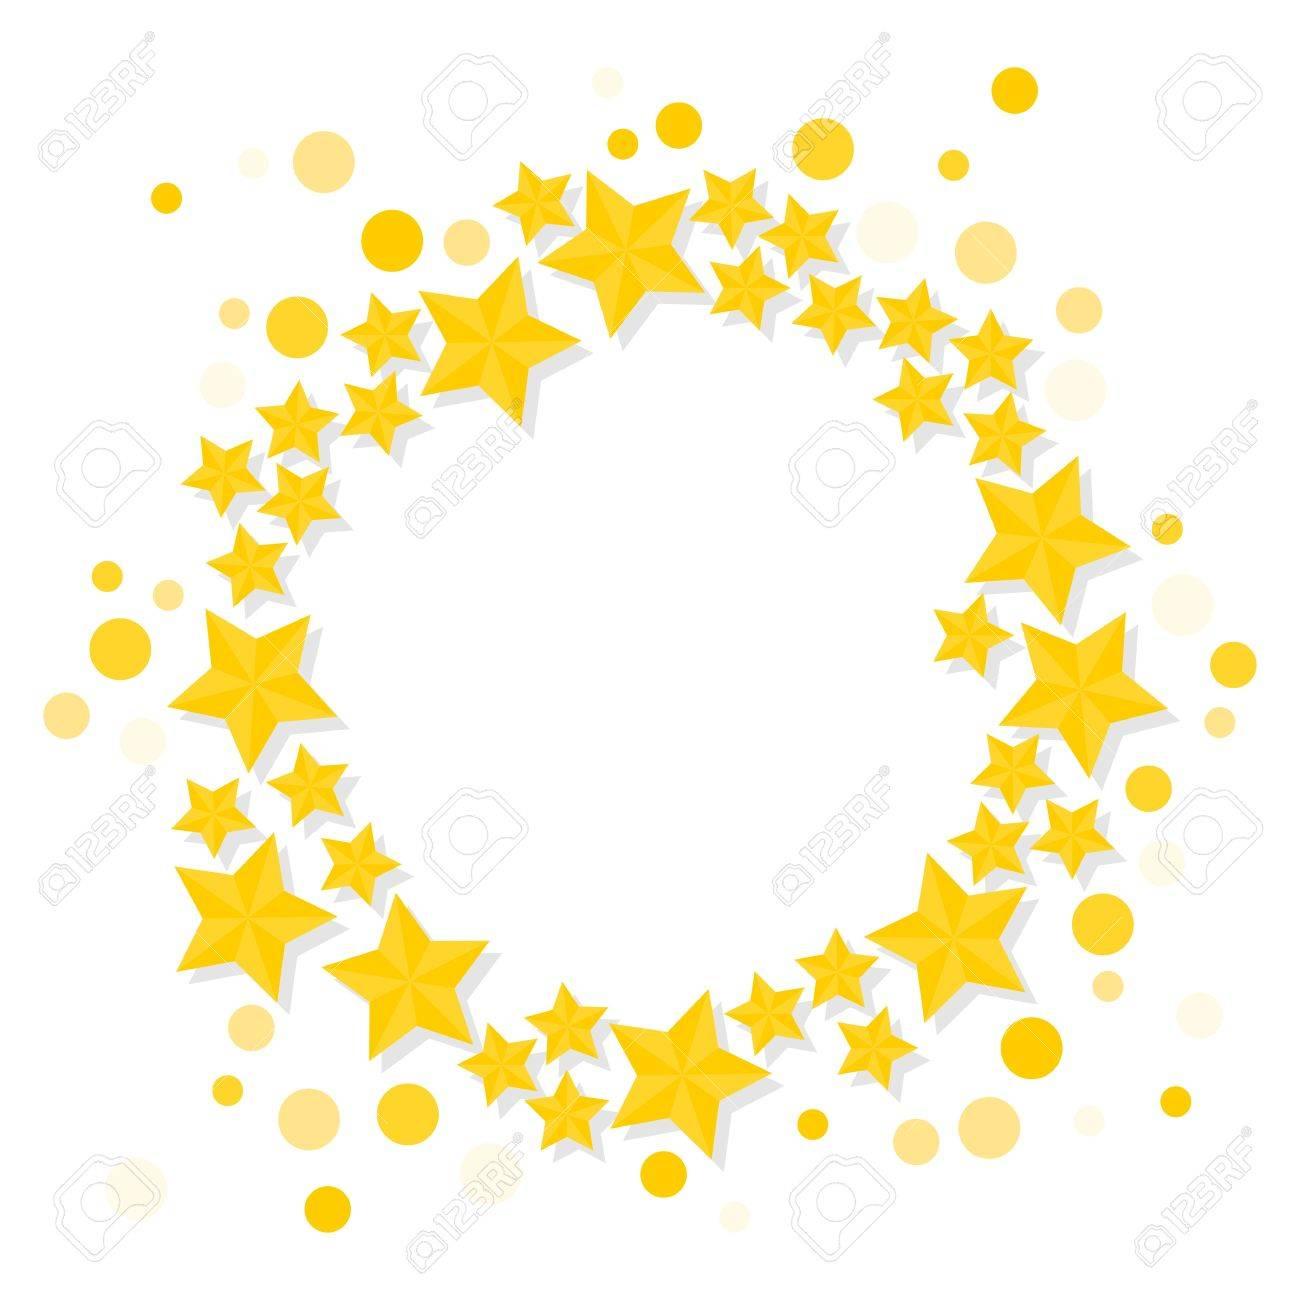 Star wreath clipart clip transparent download Golden Stars Pictures | Free download best Golden Stars ... clip transparent download